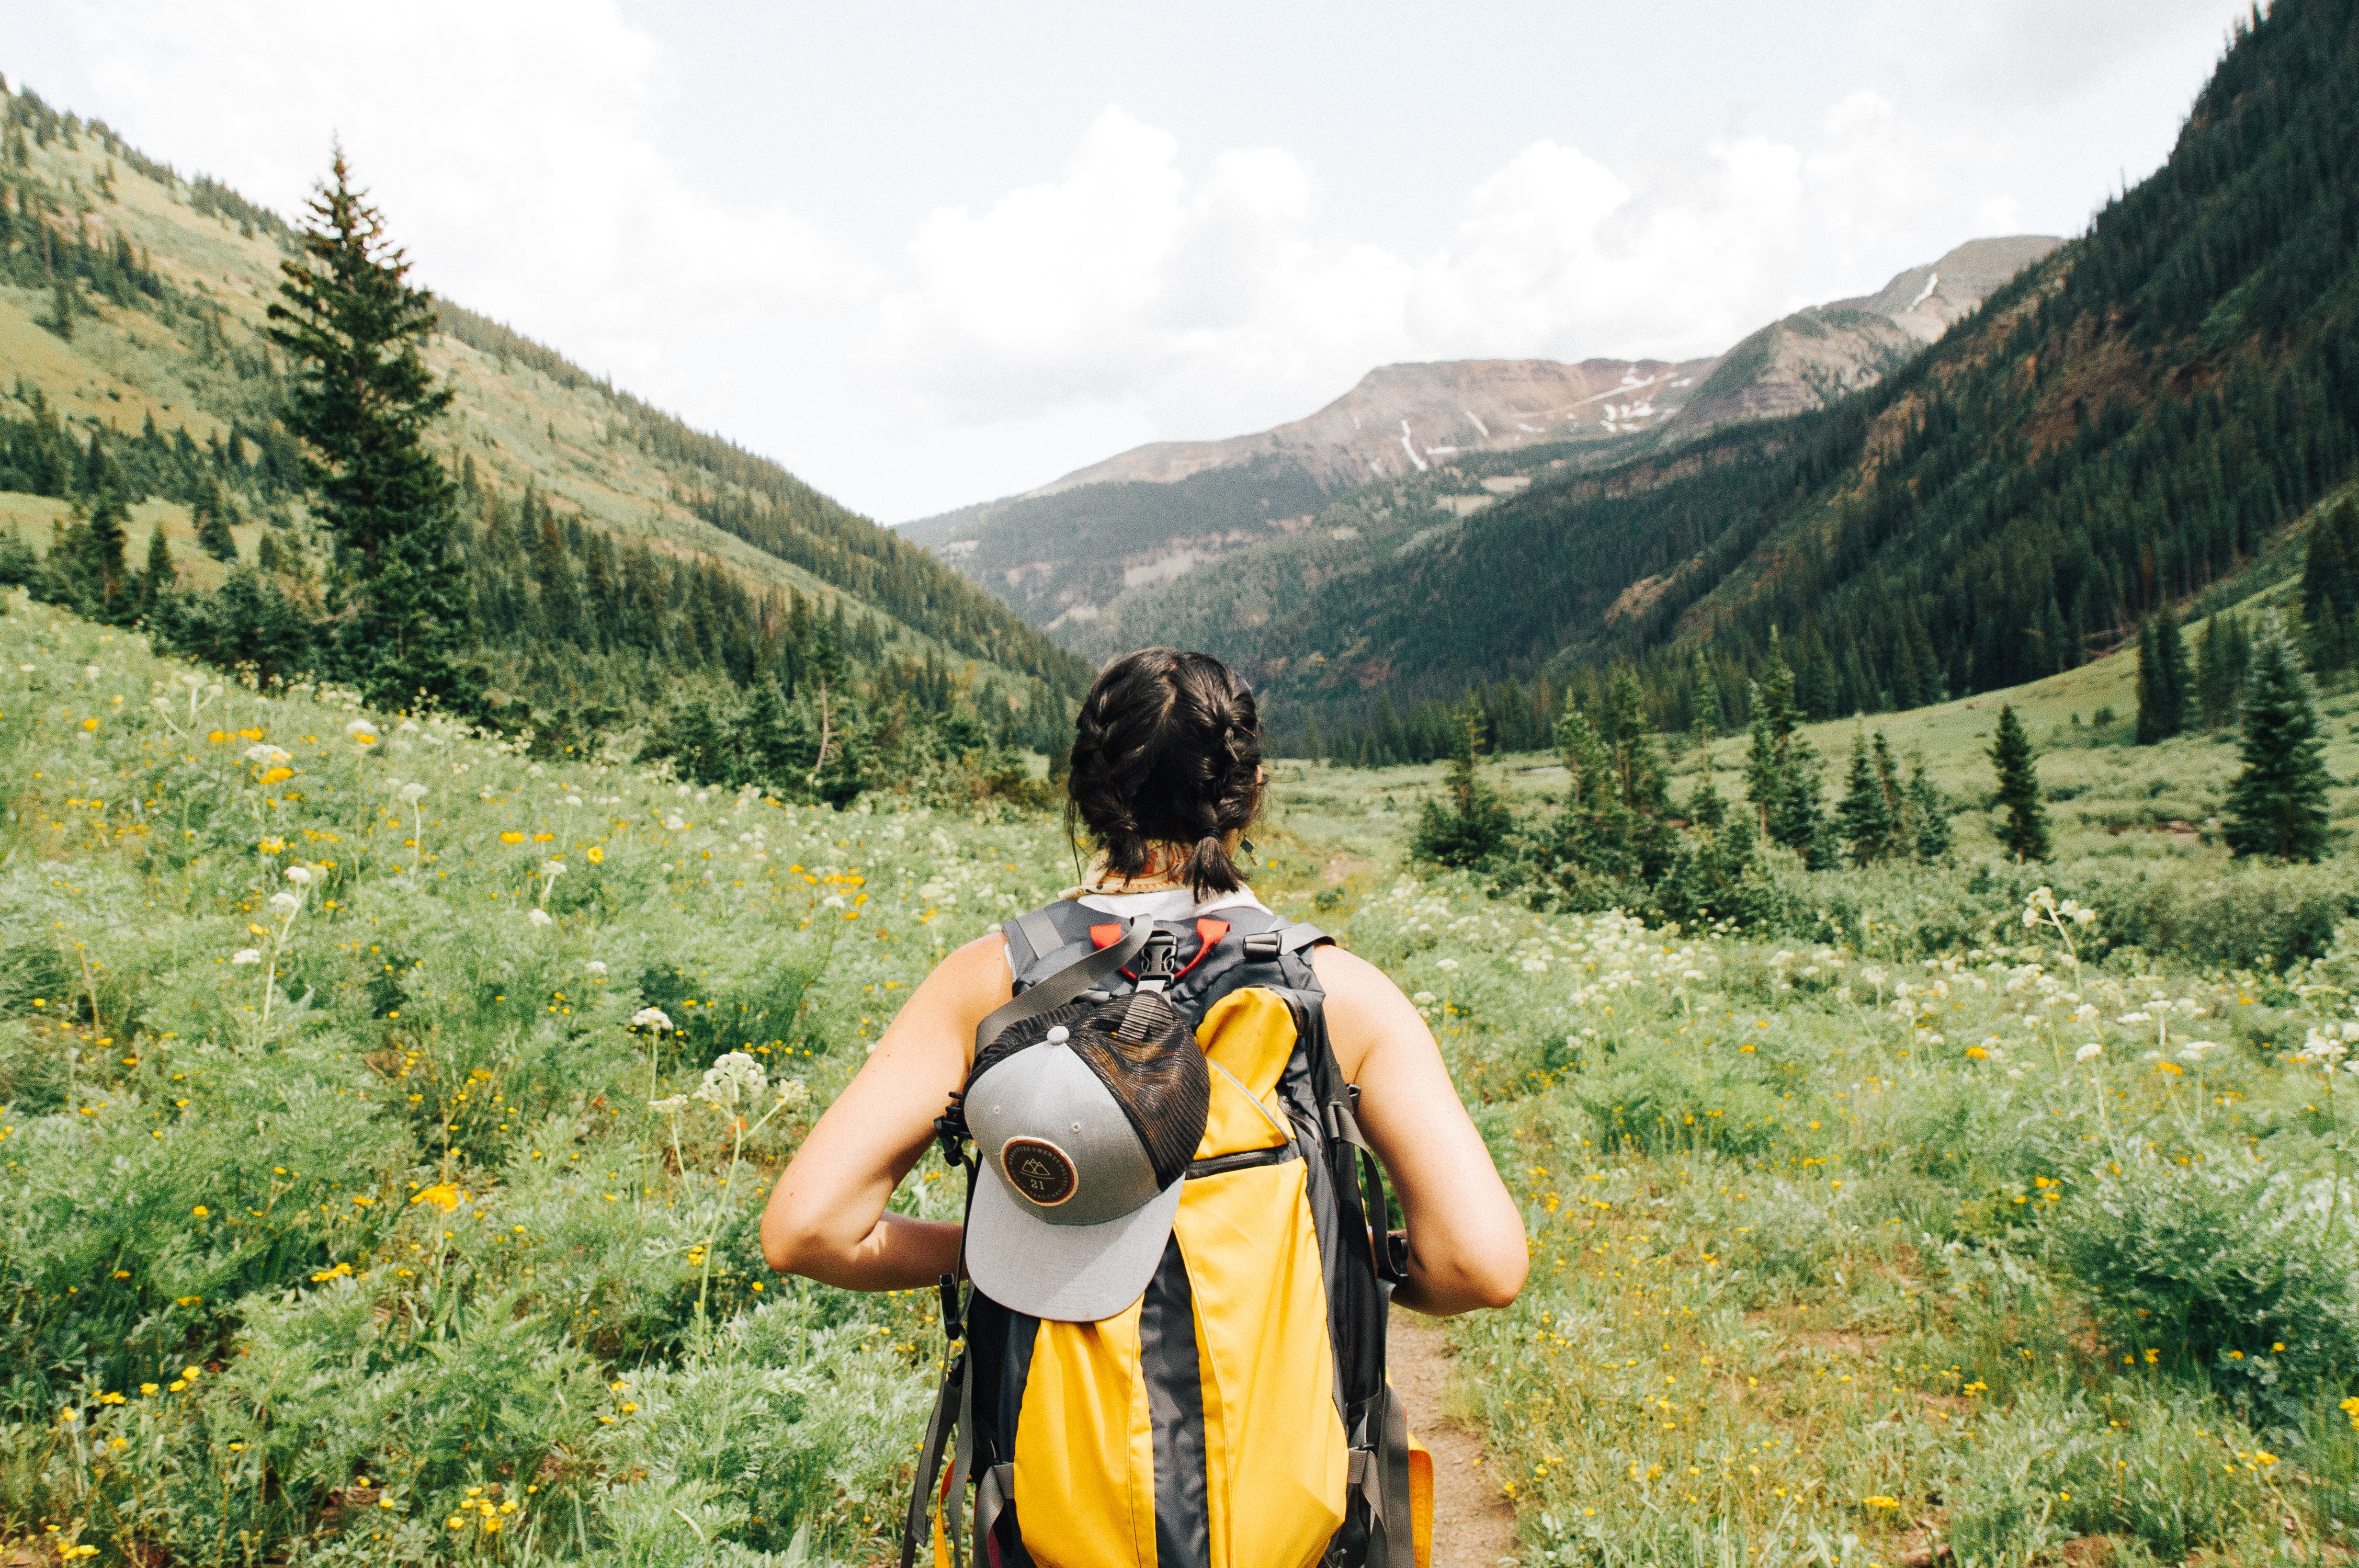 hiking randonnée femme sac à dos